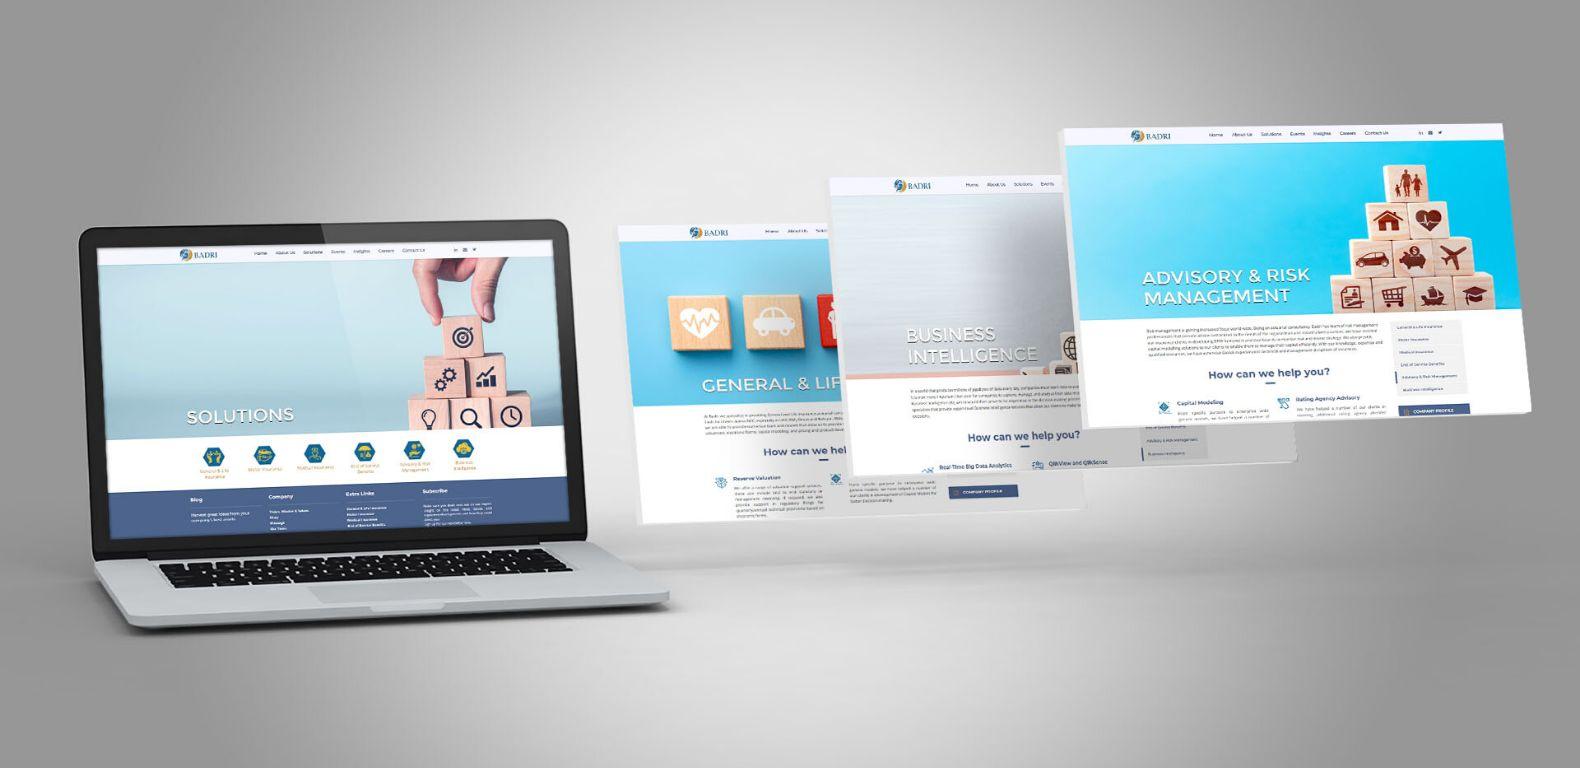 Badri-Consultancy-website-design-development-Services-page